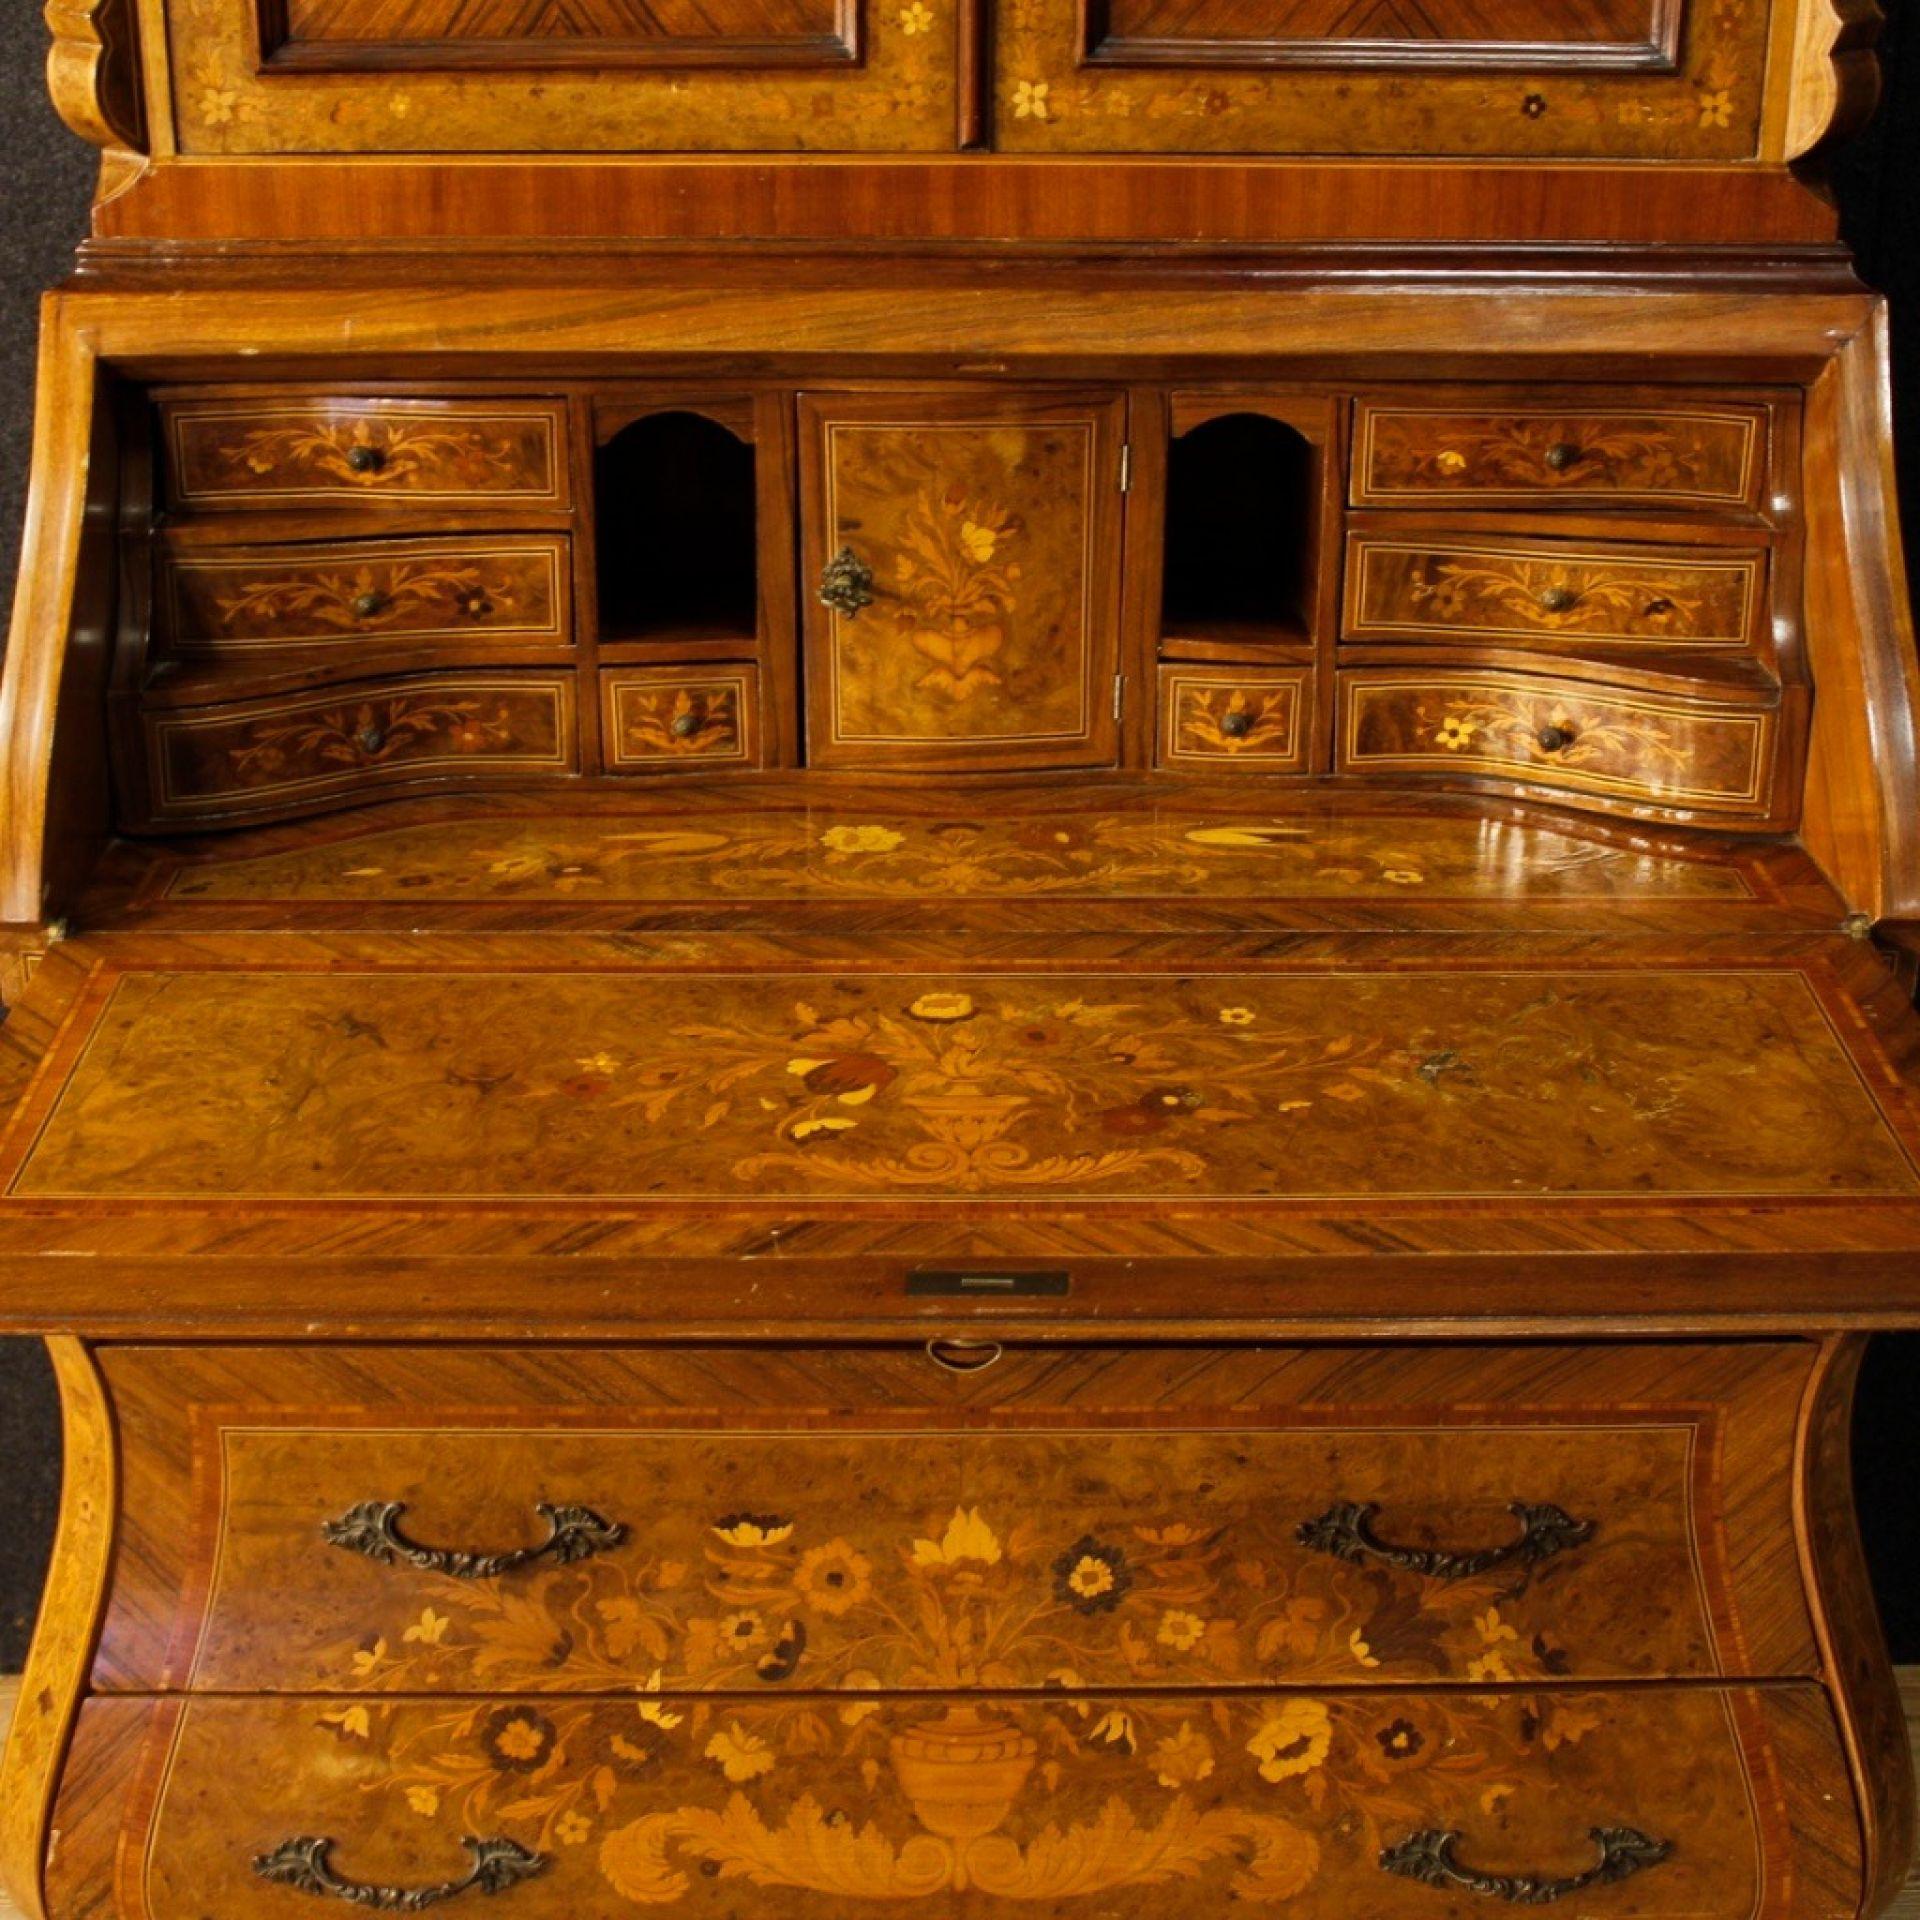 Italian Inlaid Trumeau in Walnut, Maple, Mahogany, Rosewood, Palisander